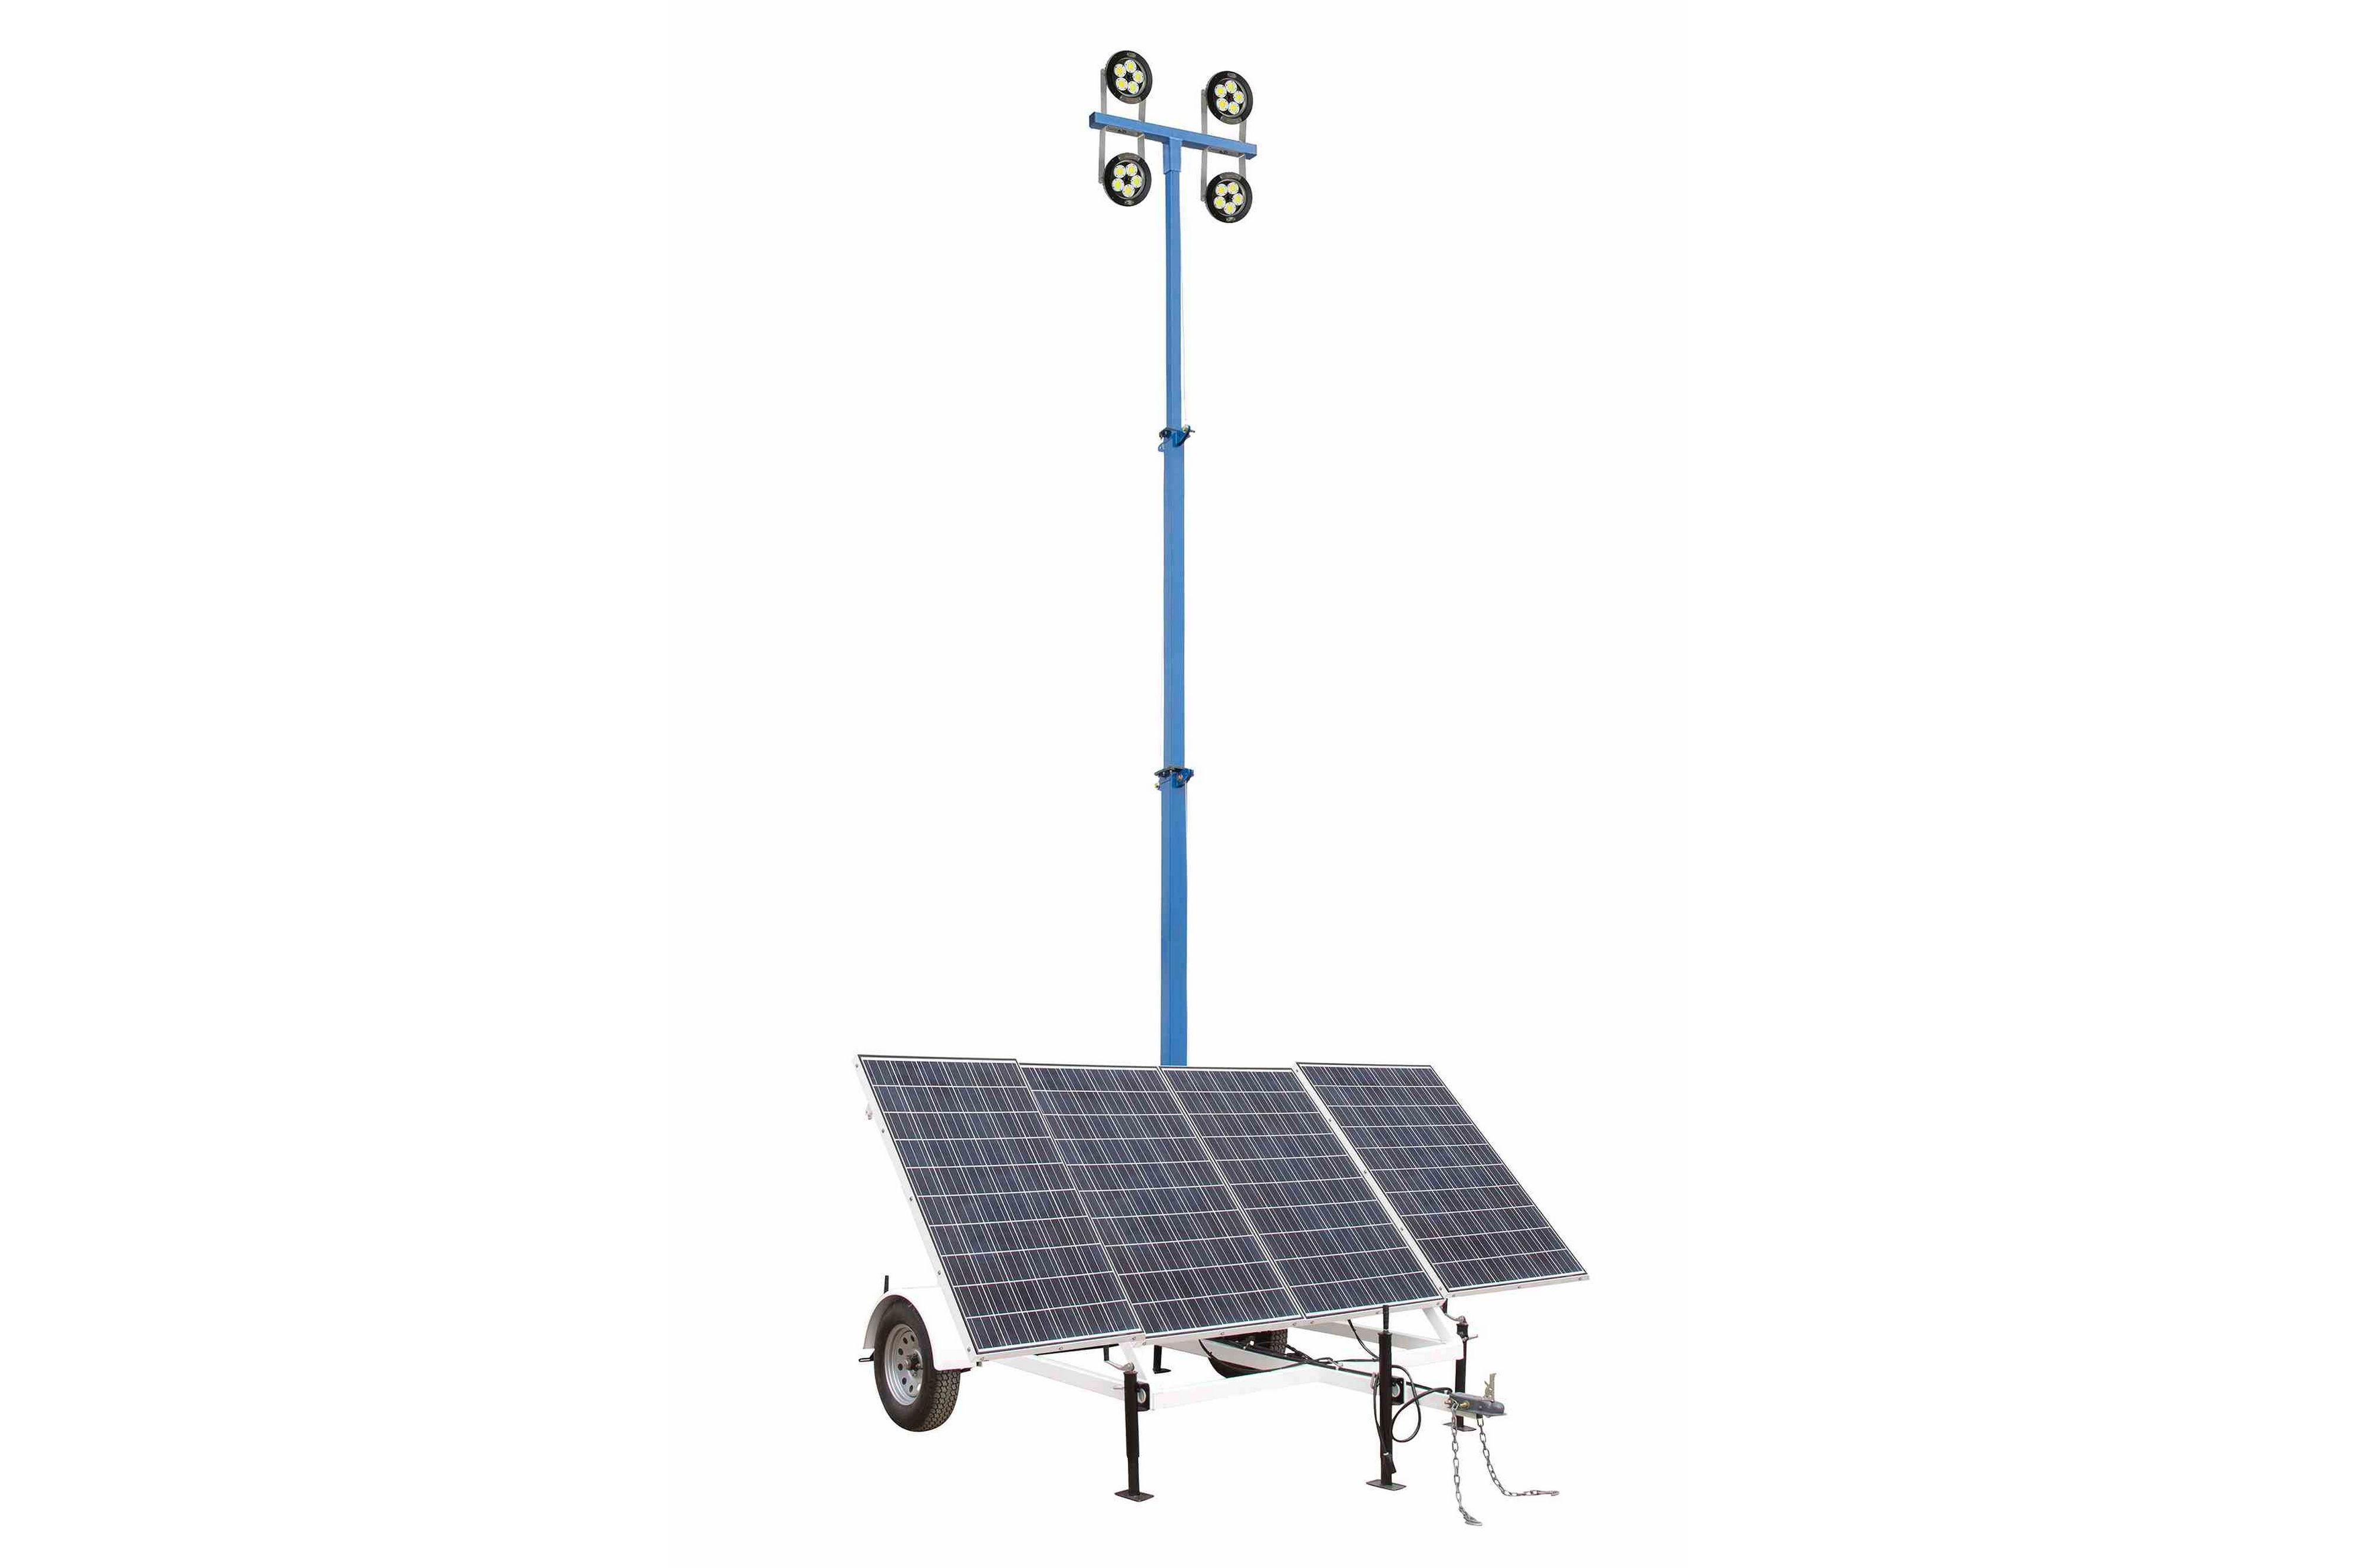 147761 Top Result 50 Inspirational Portable solar Panels Image 2018 Hdj5